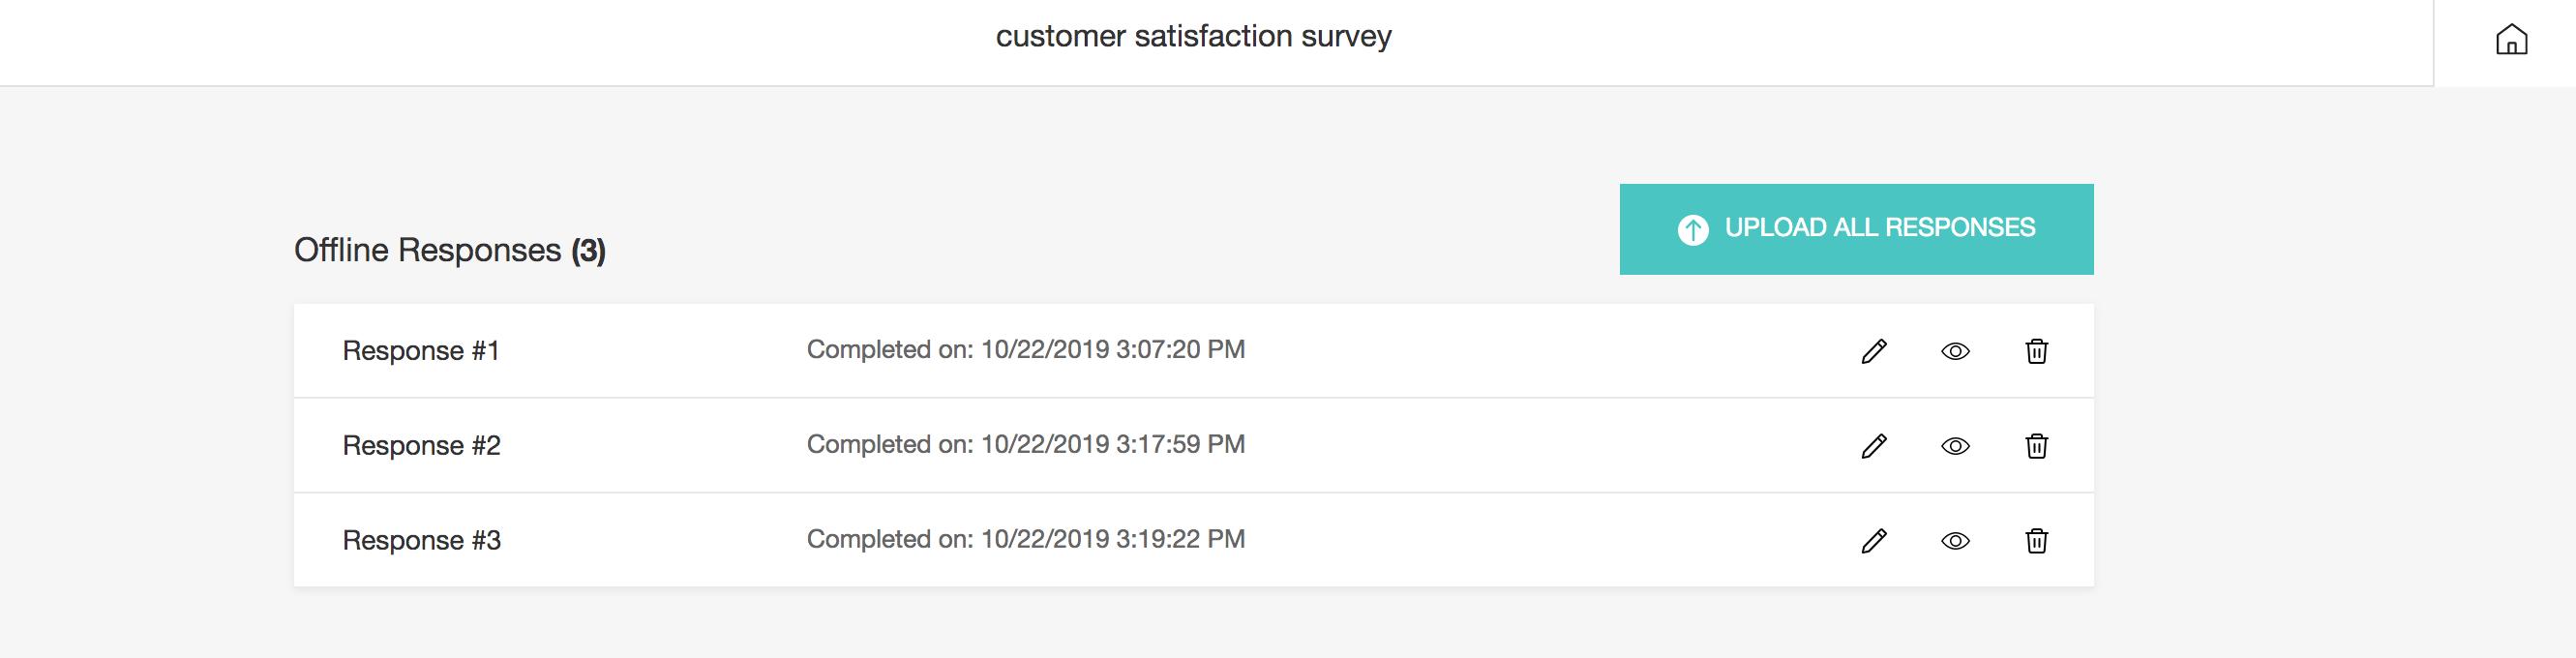 Offline survey upload responses